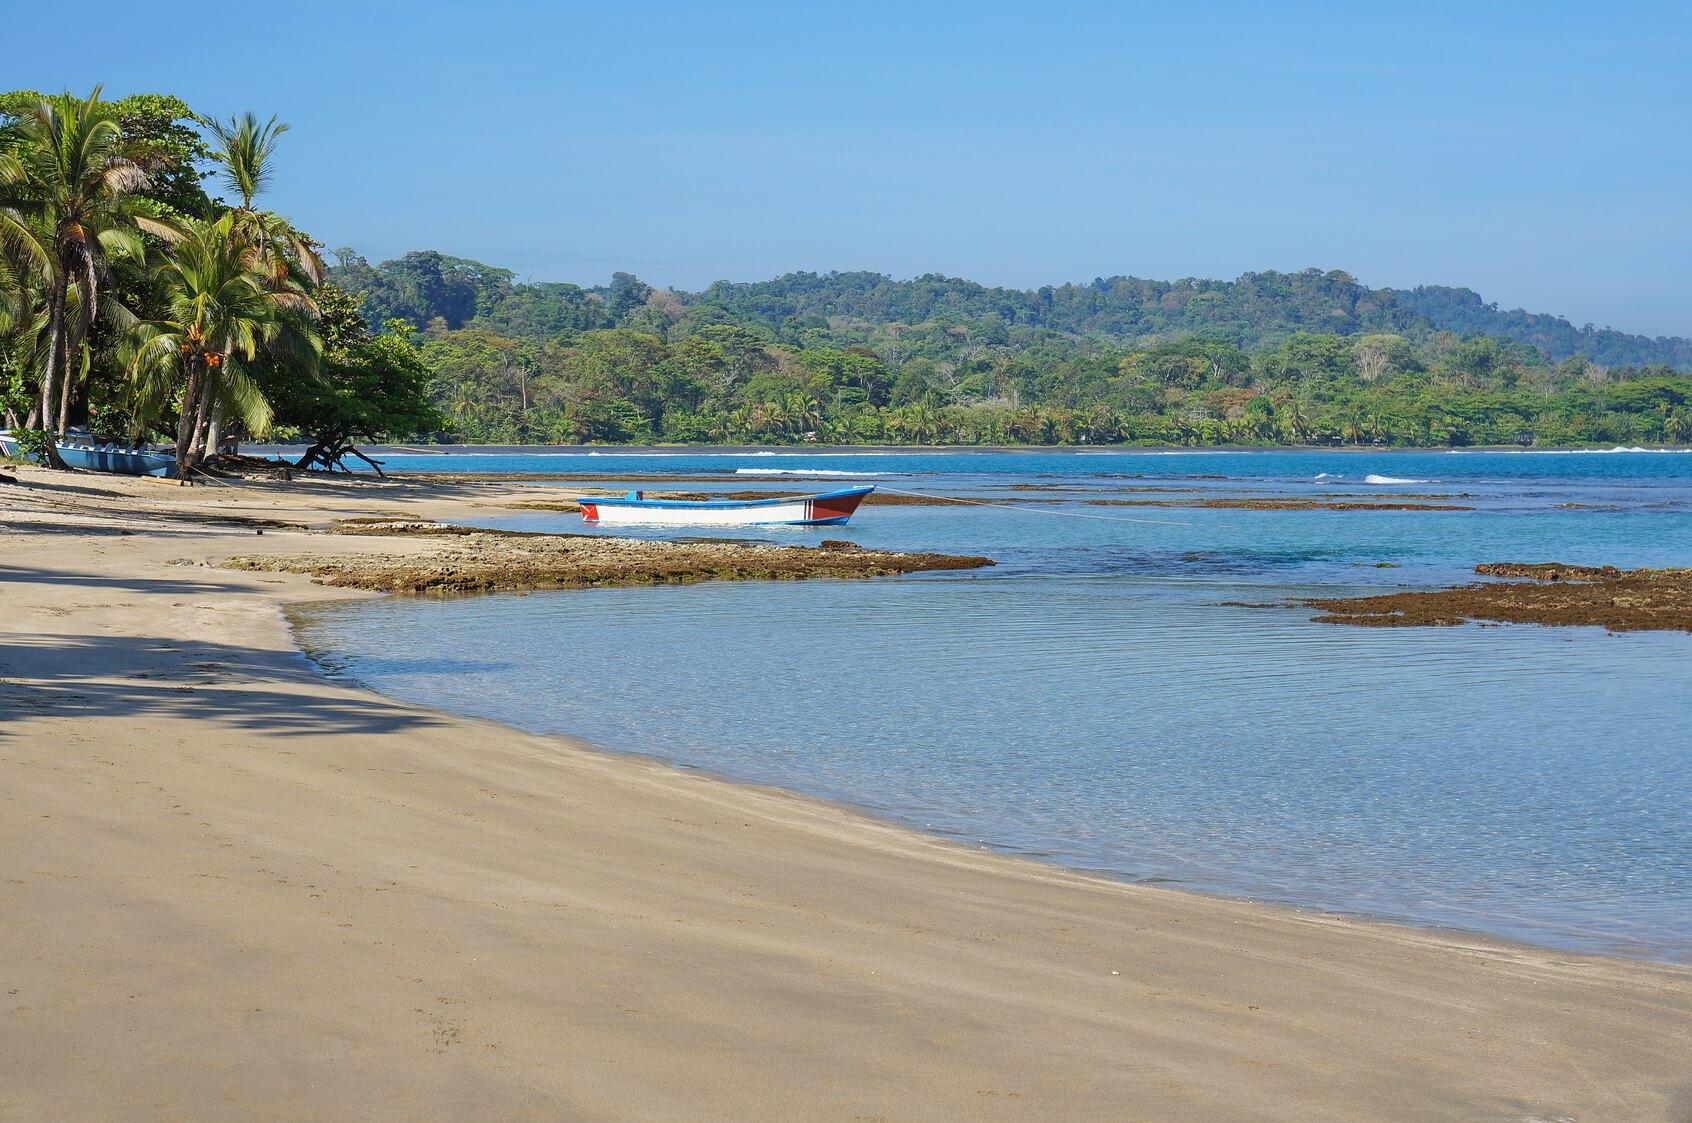 Peaceful beach on Caribbean coast of Costa Rica